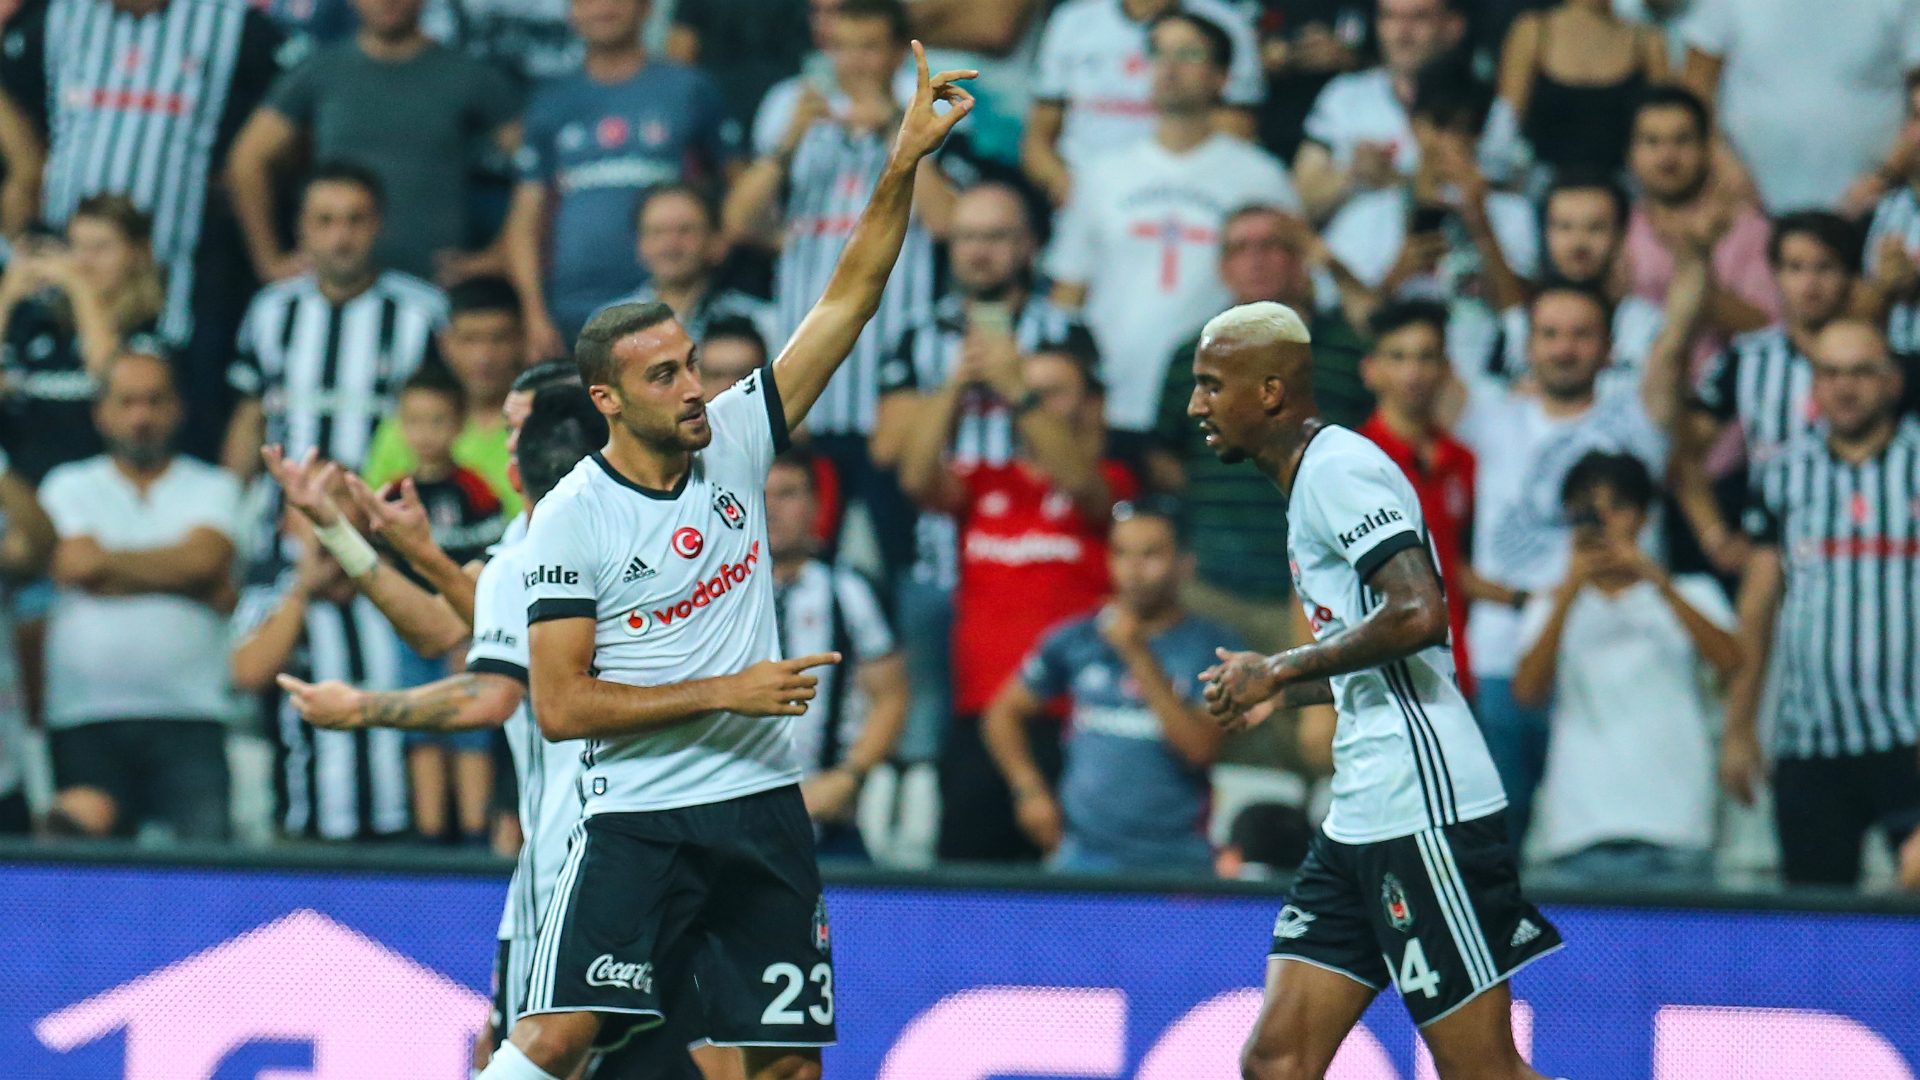 Cenk Tosun Talisca Besiktas Konyaspor 09182017